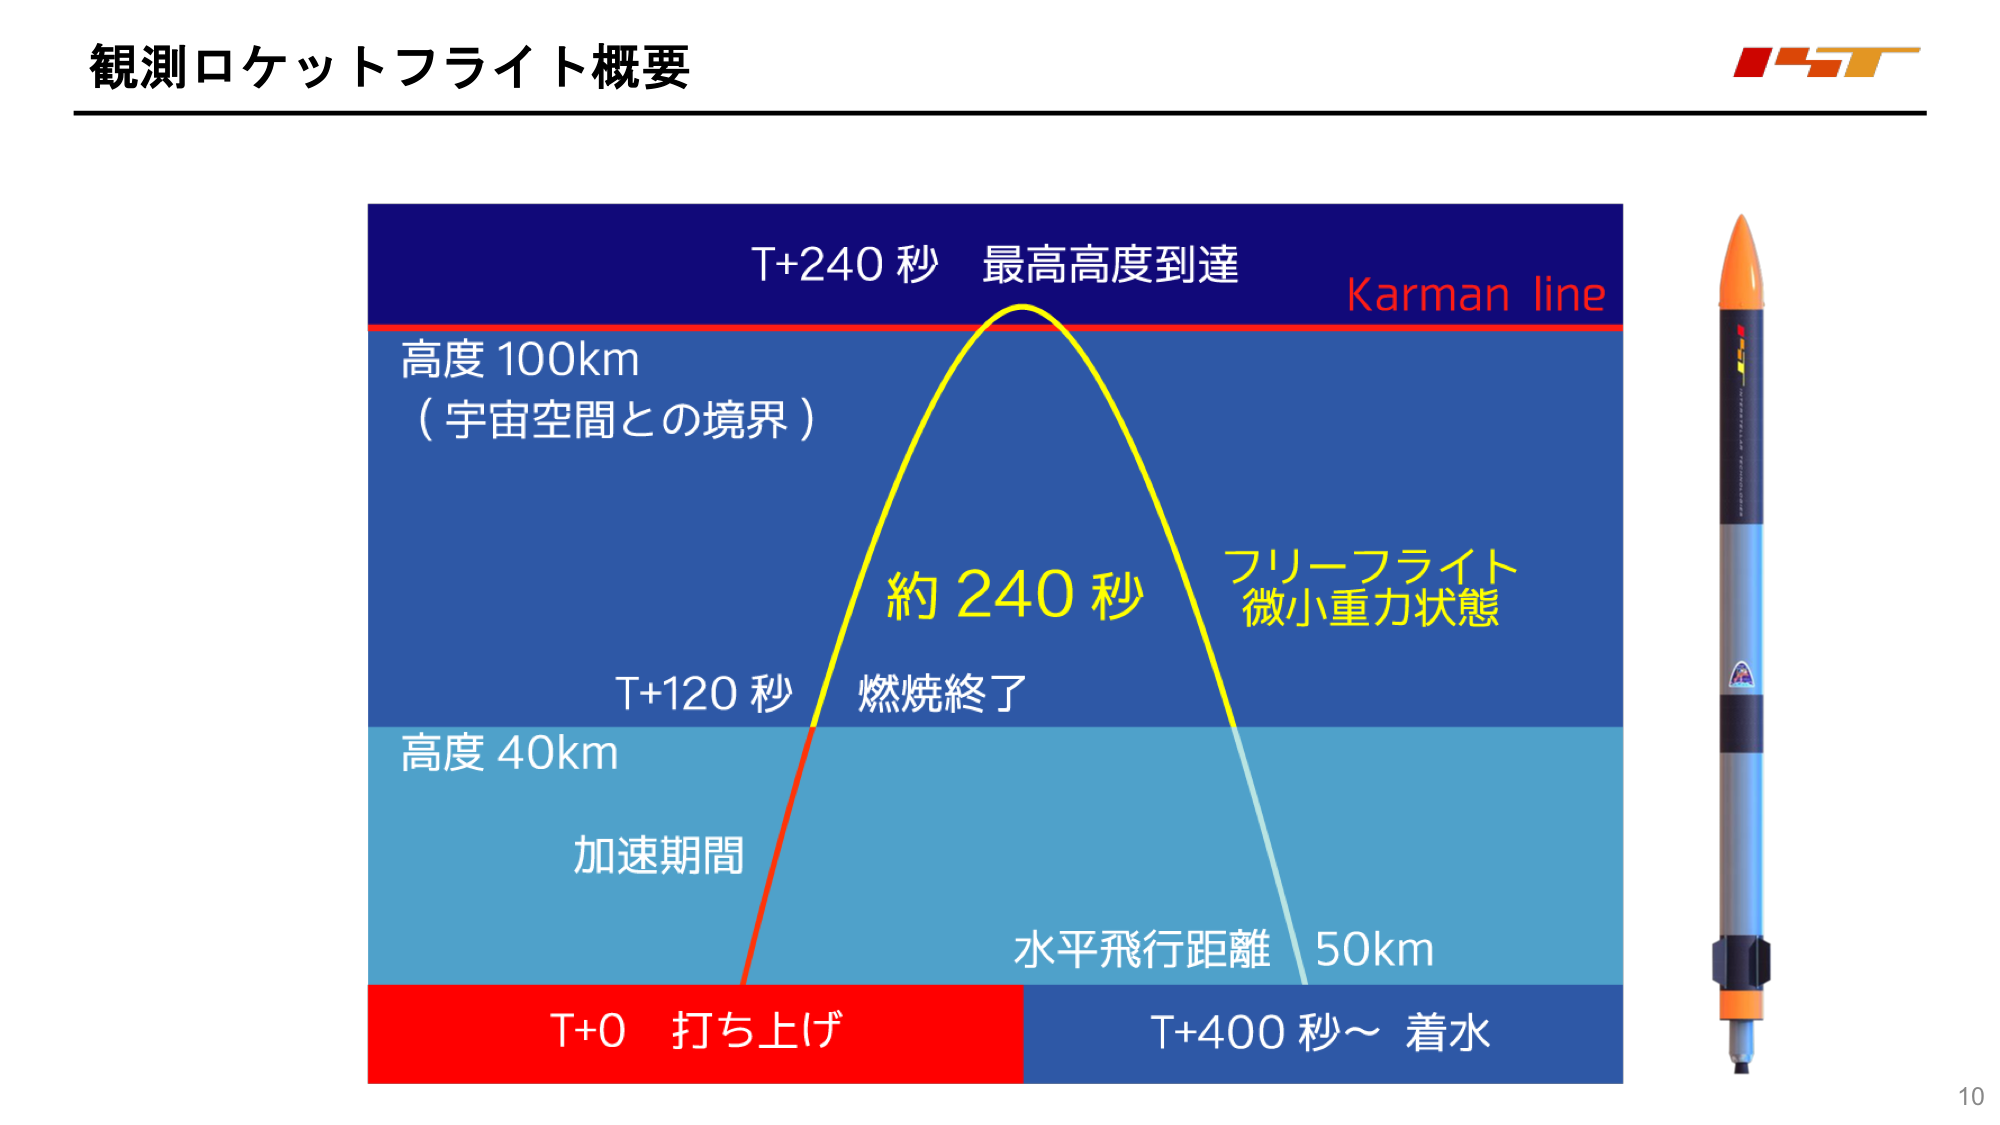 f:id:Imamura:20191126135056p:plain